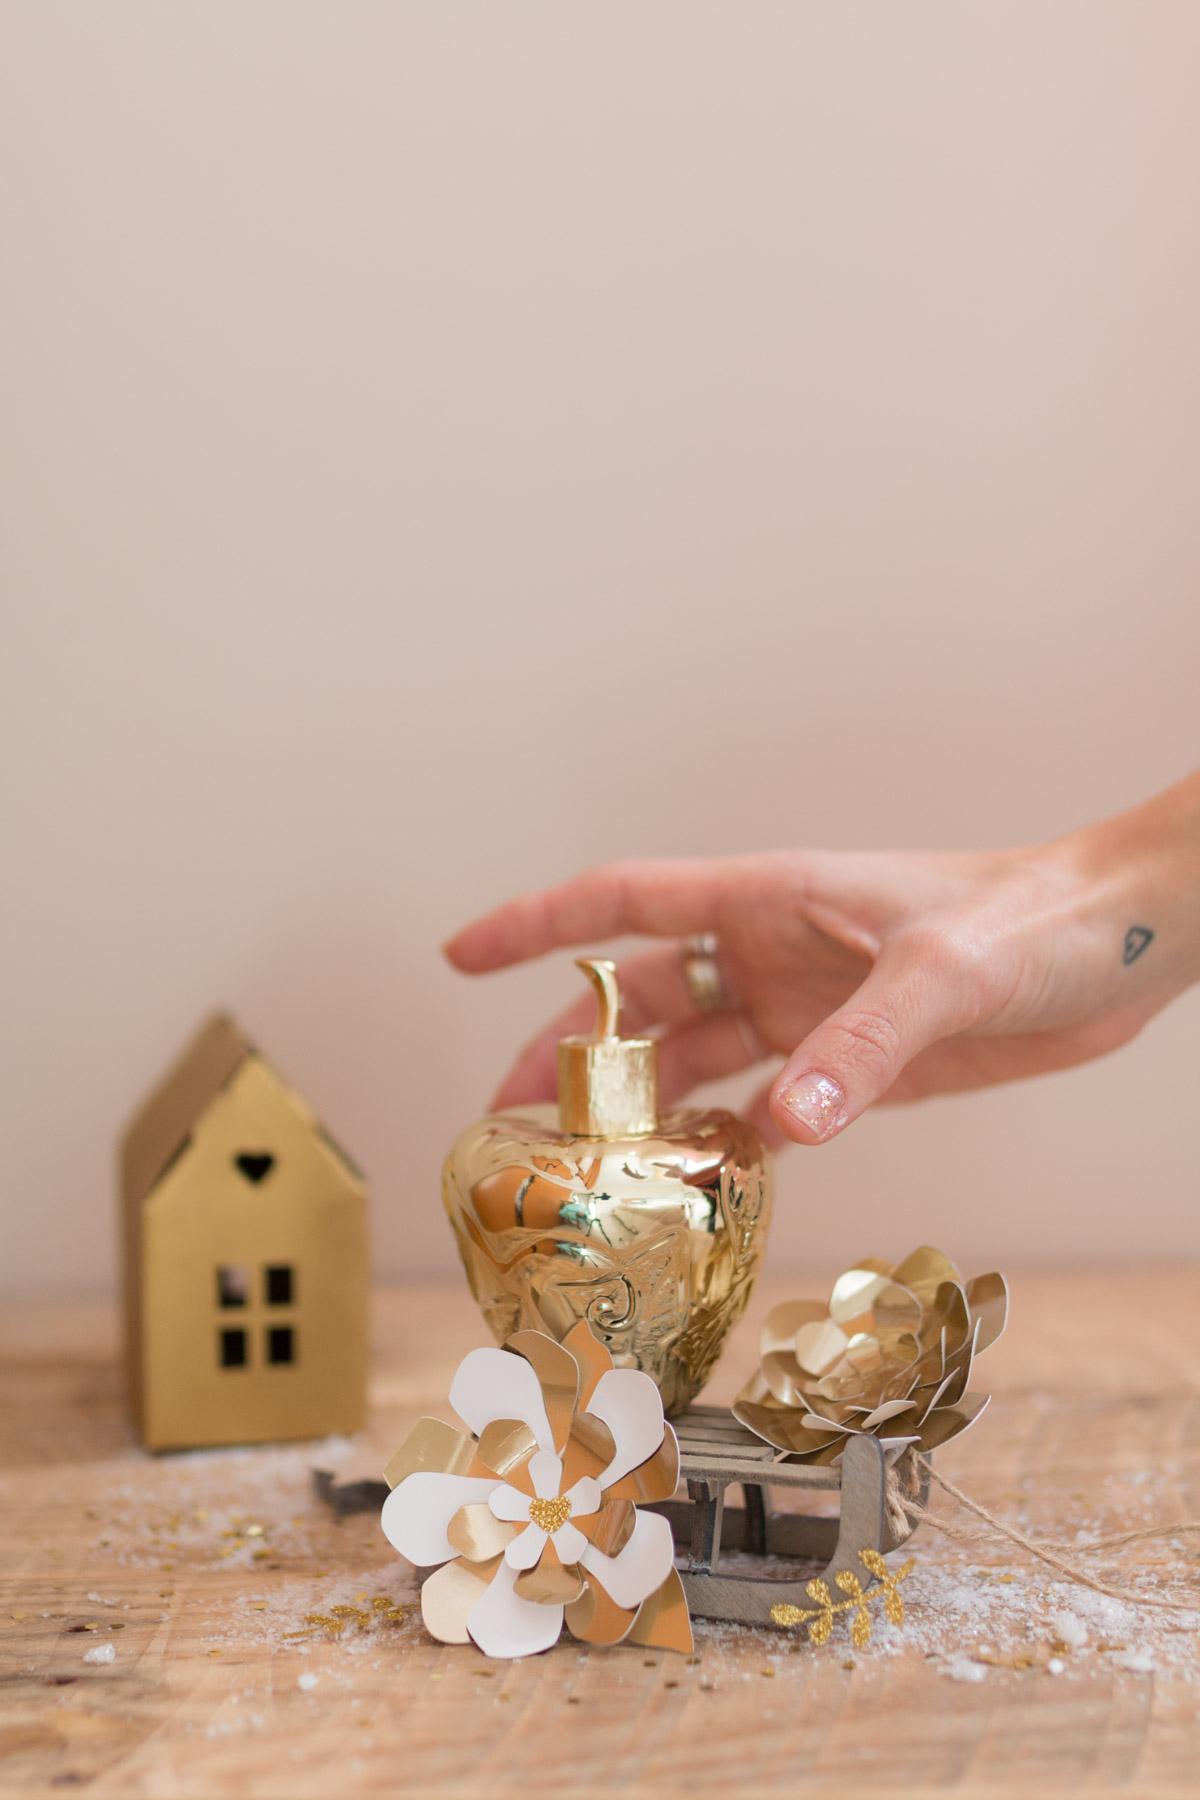 Lolita lempicka DIY boite pomme  I Sp4nkblog-4